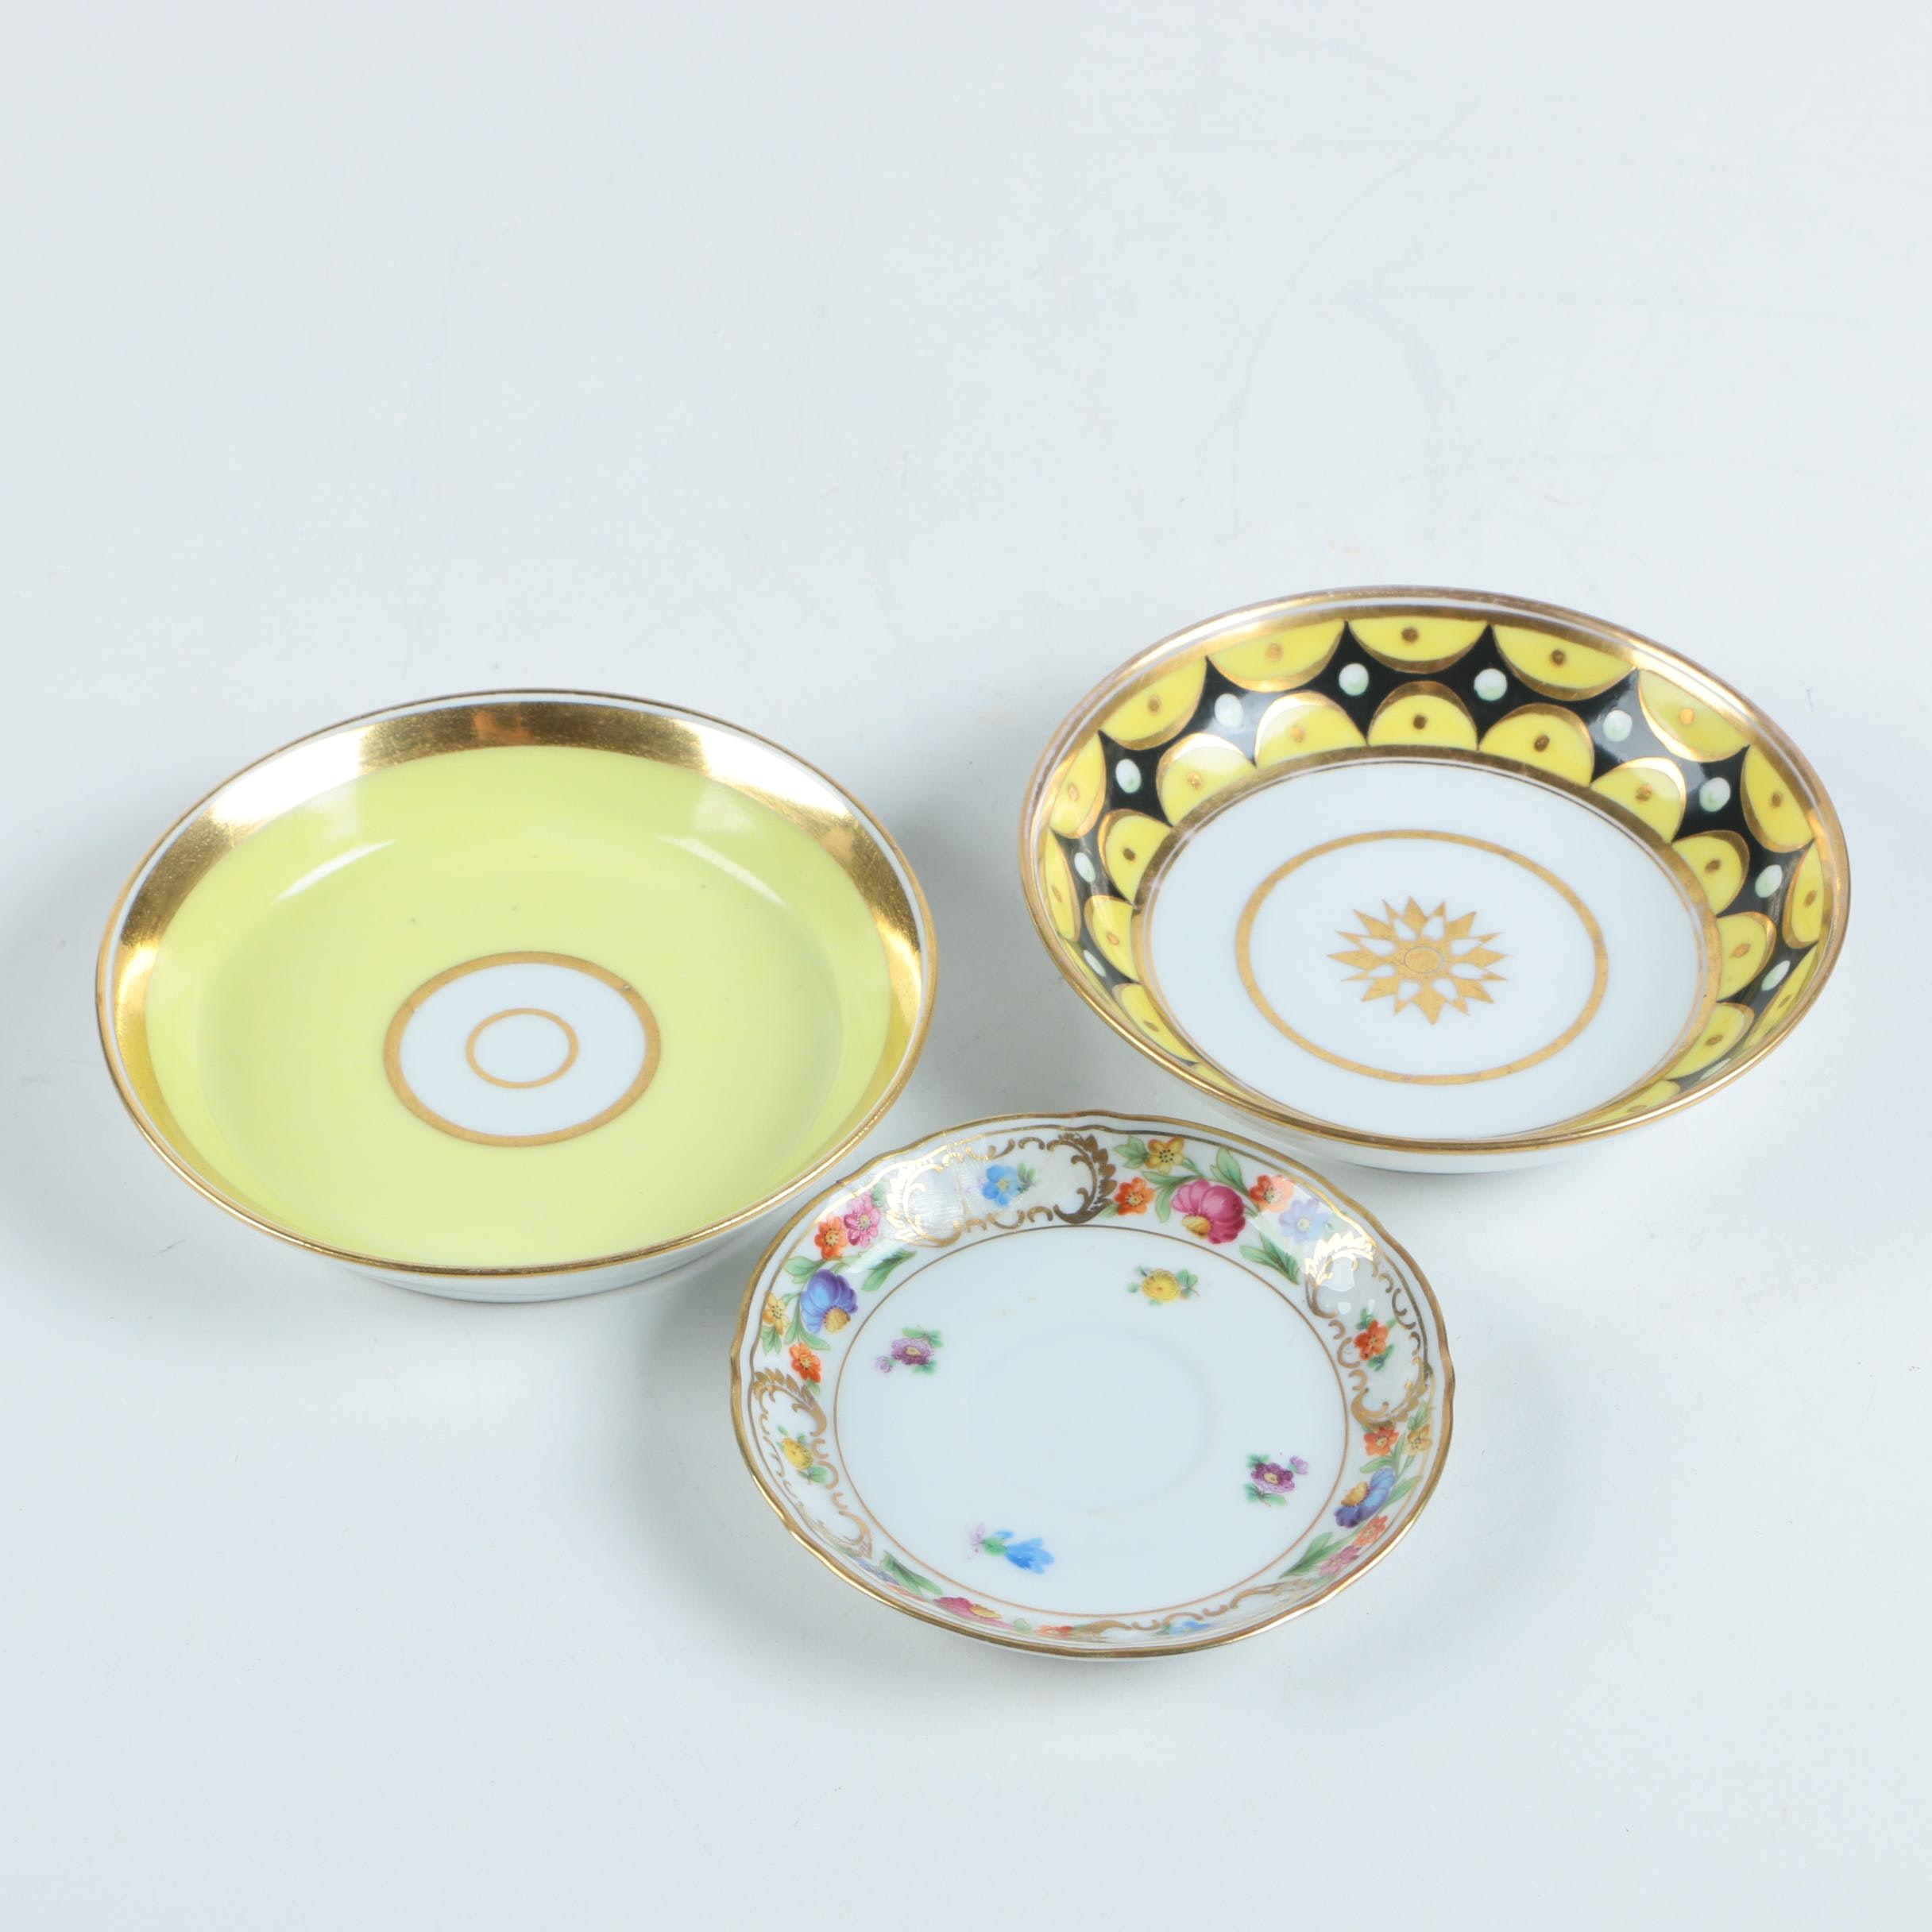 Porcelain Plates Including Schumann Bavaria 1945-49